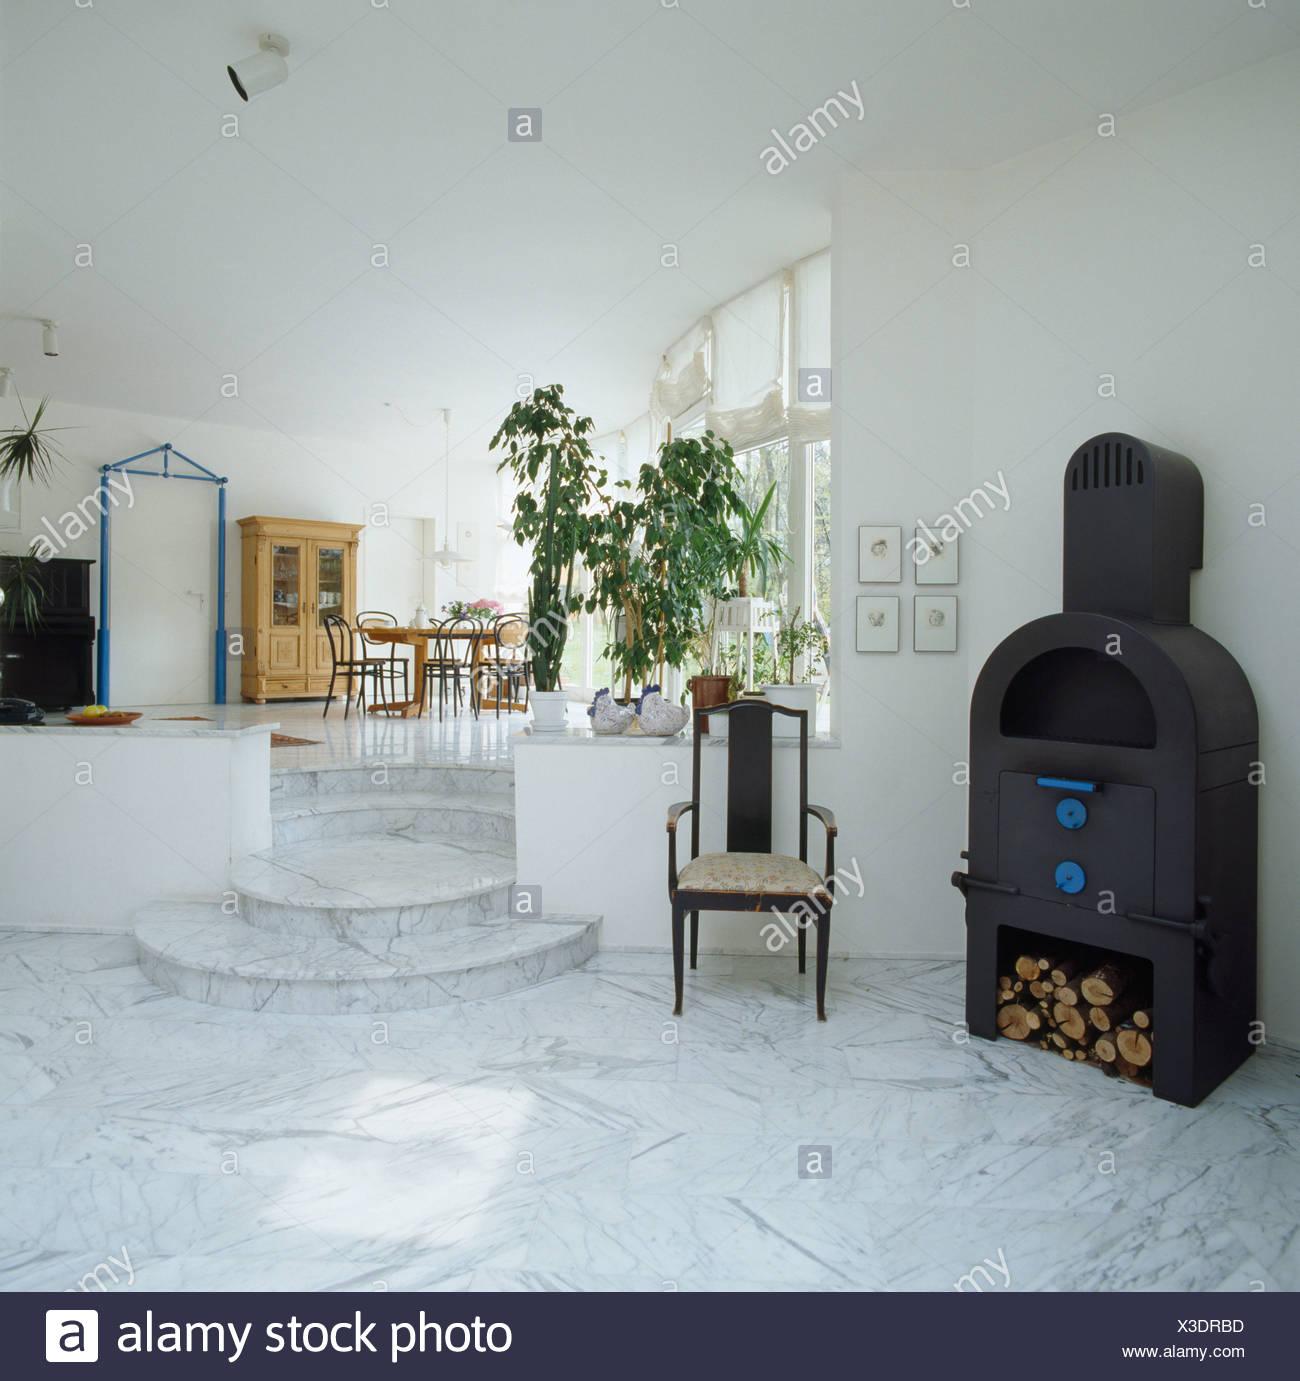 Antiker Stuhl Neben Schwarzen Gusseisen Ofen In Offene Split Level